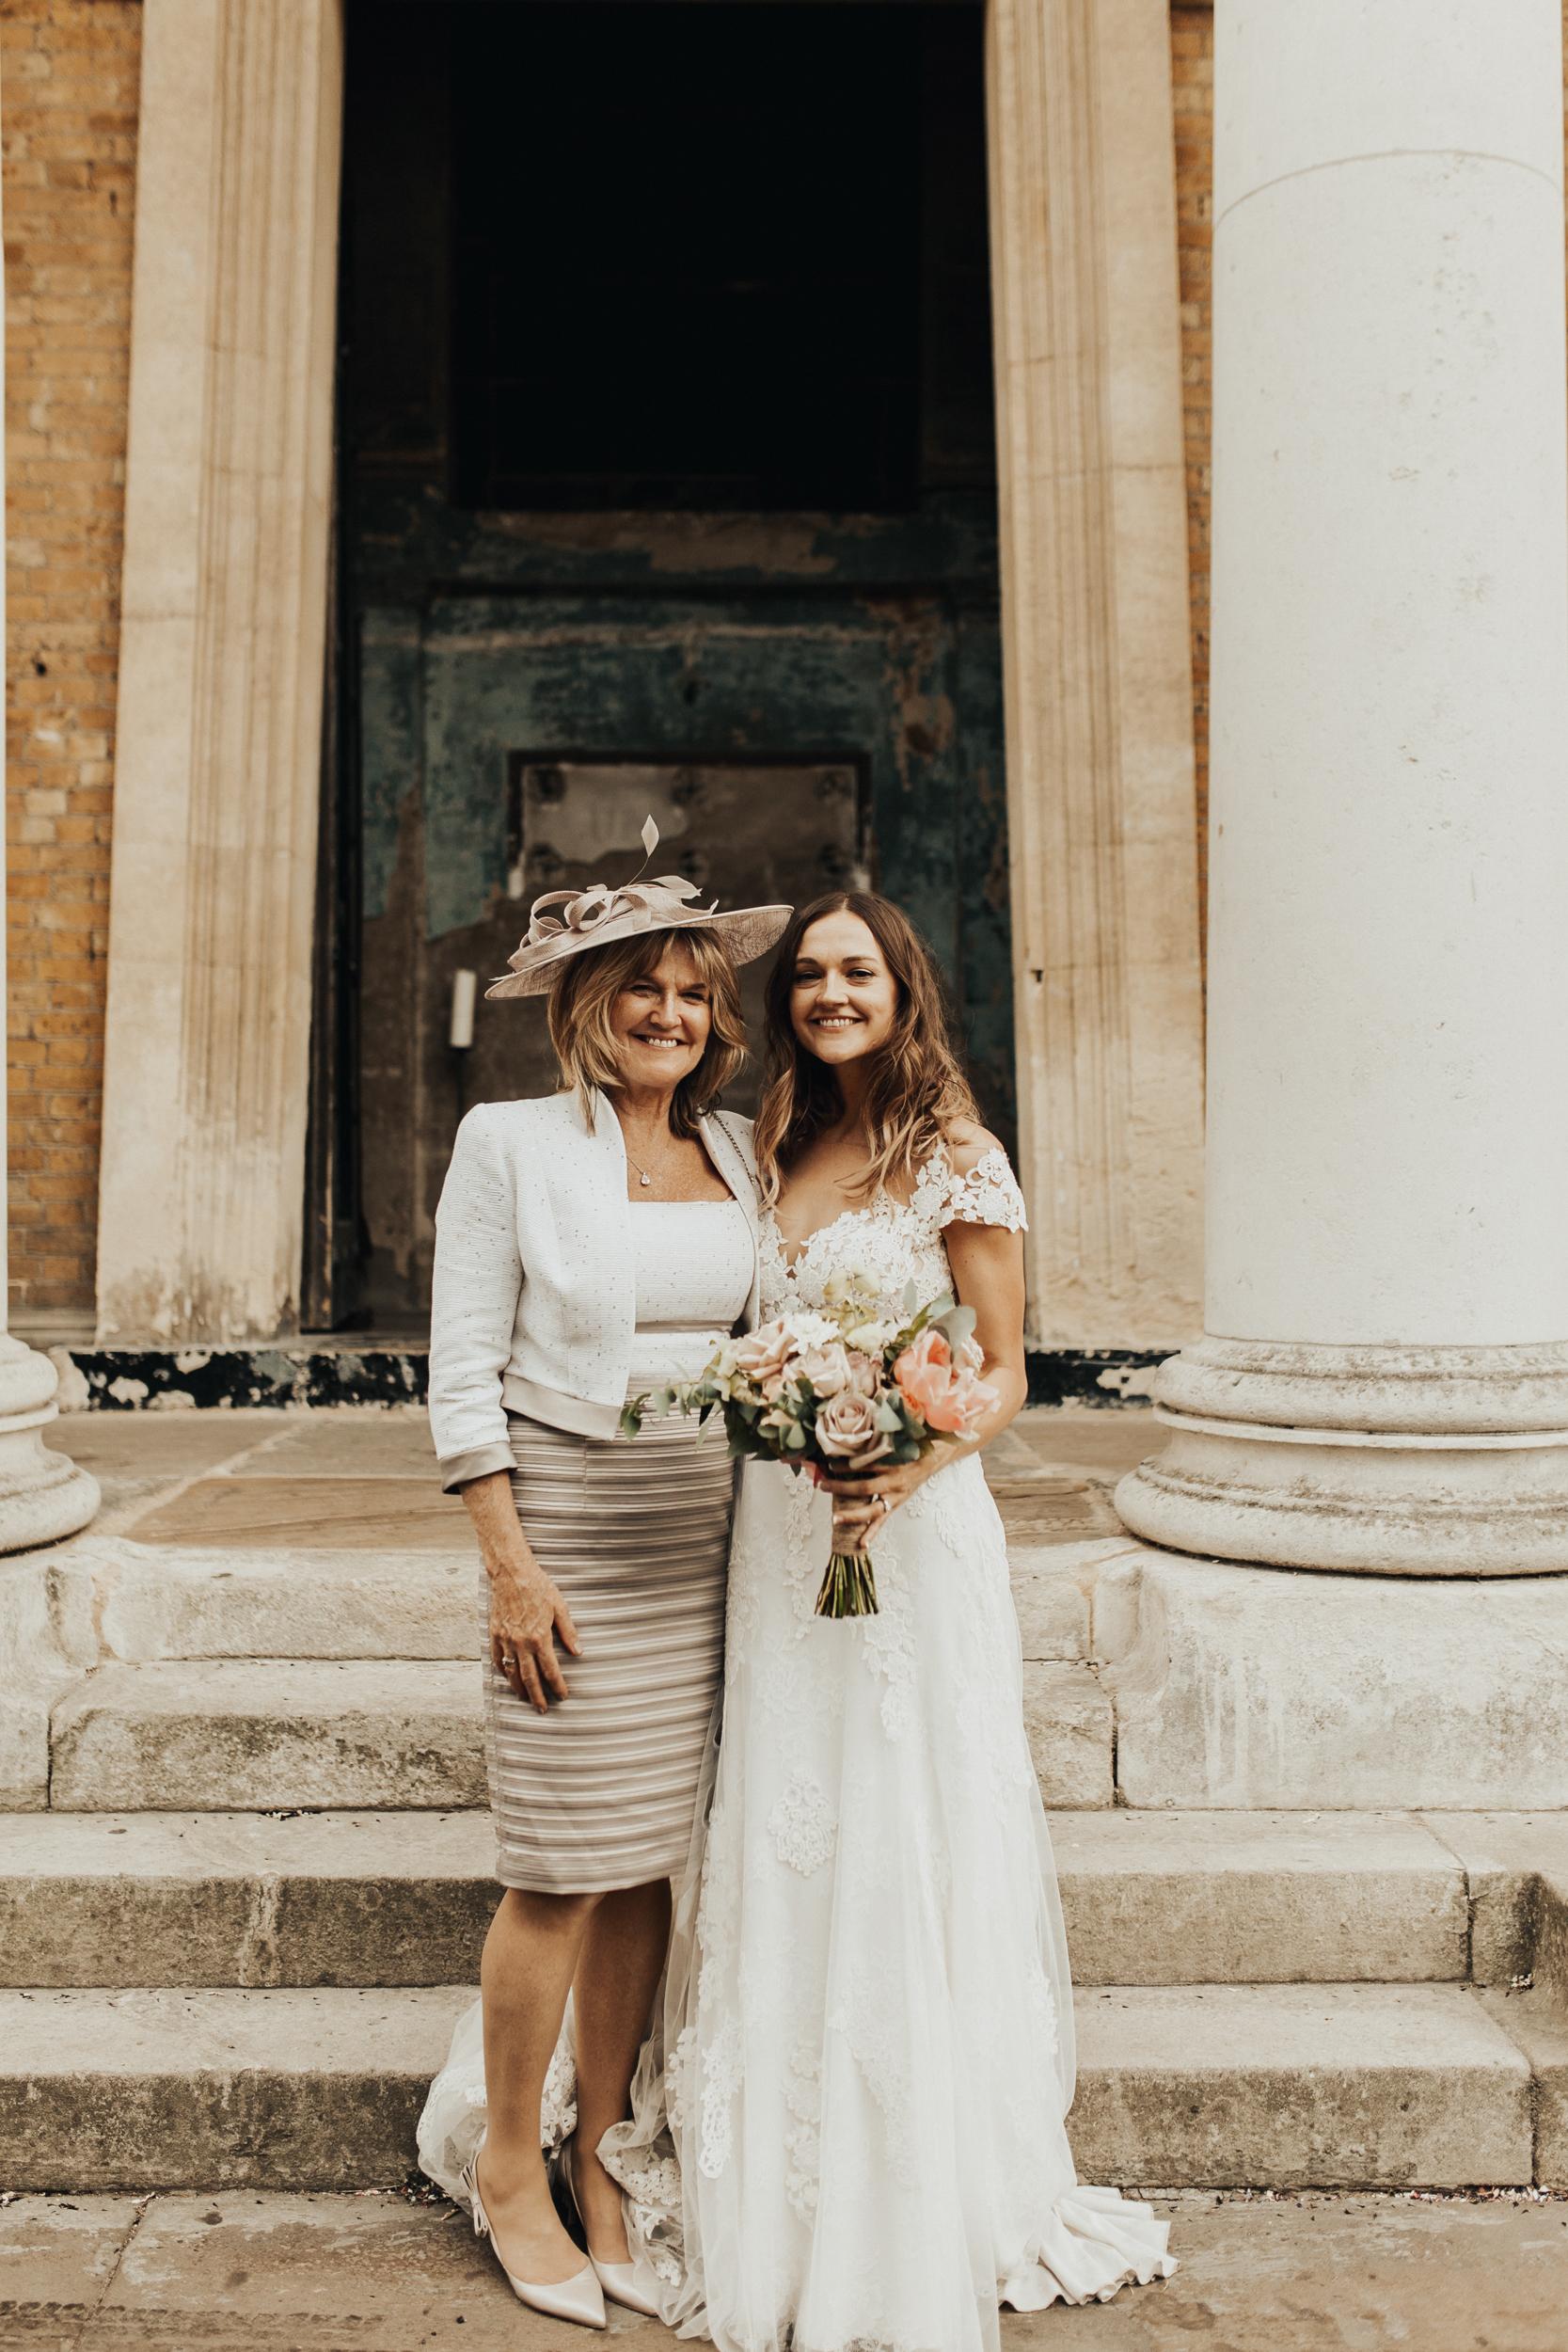 Laura-Benn-The-Asylum-London-The-Ace-Hotel-Wedding-Alternative-Darina-Stoda-Photography-440.jpg